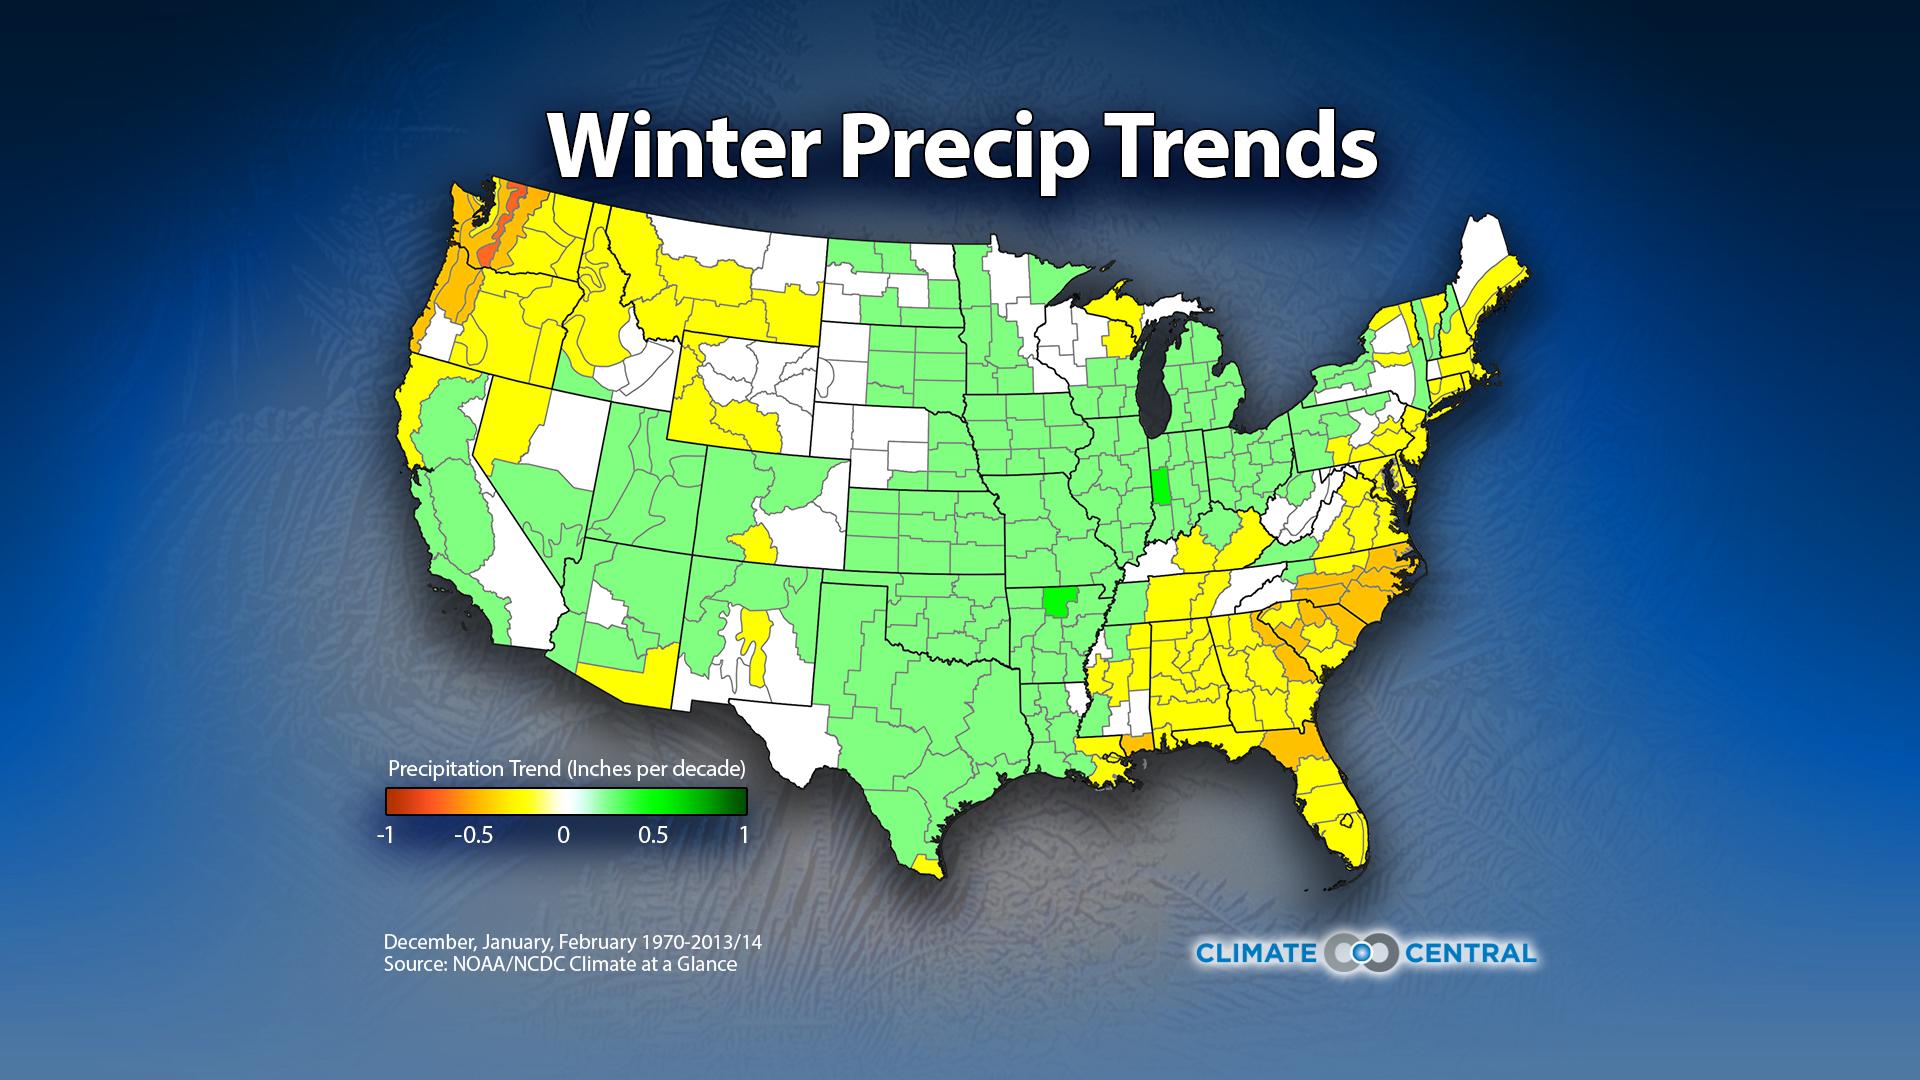 Winter Precipitation Trends